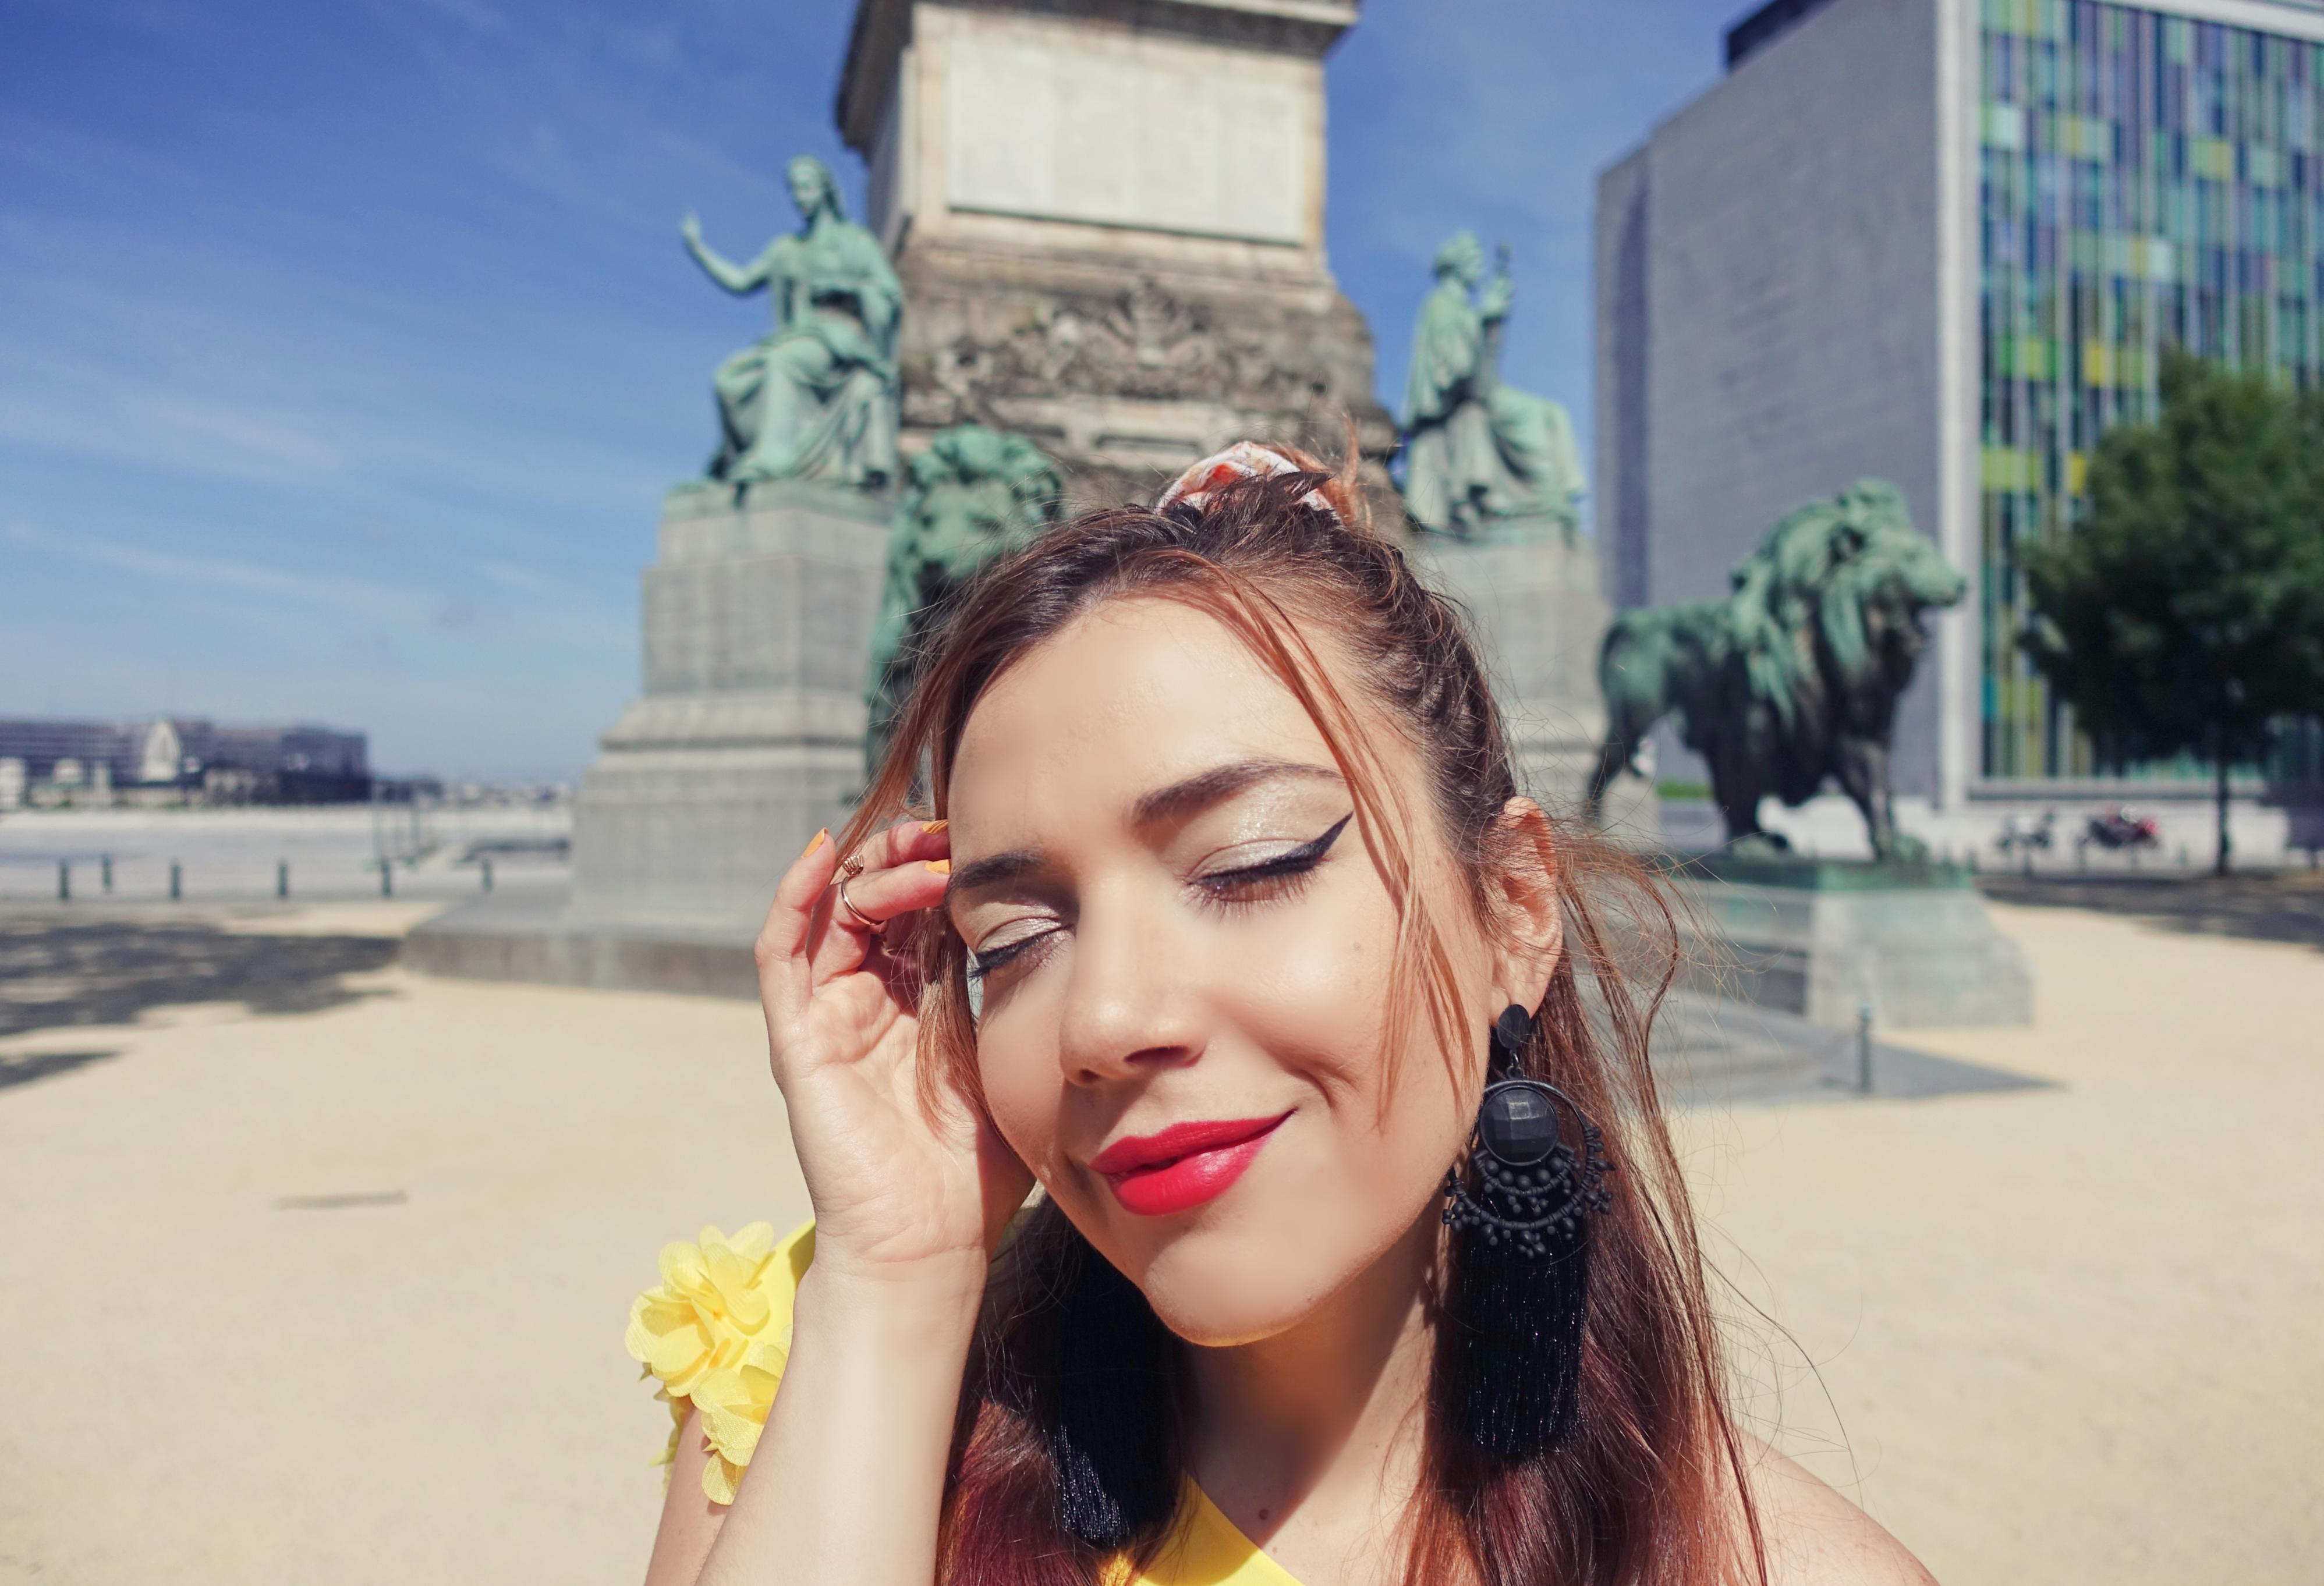 Maquillaje-de-verano-blog-de-moda-ChicAdicta-fashionista-influencer-espana-PiensaenChic-Chic-adicta-pendientes-largos-Piensa-en-Chic-fashion-travel